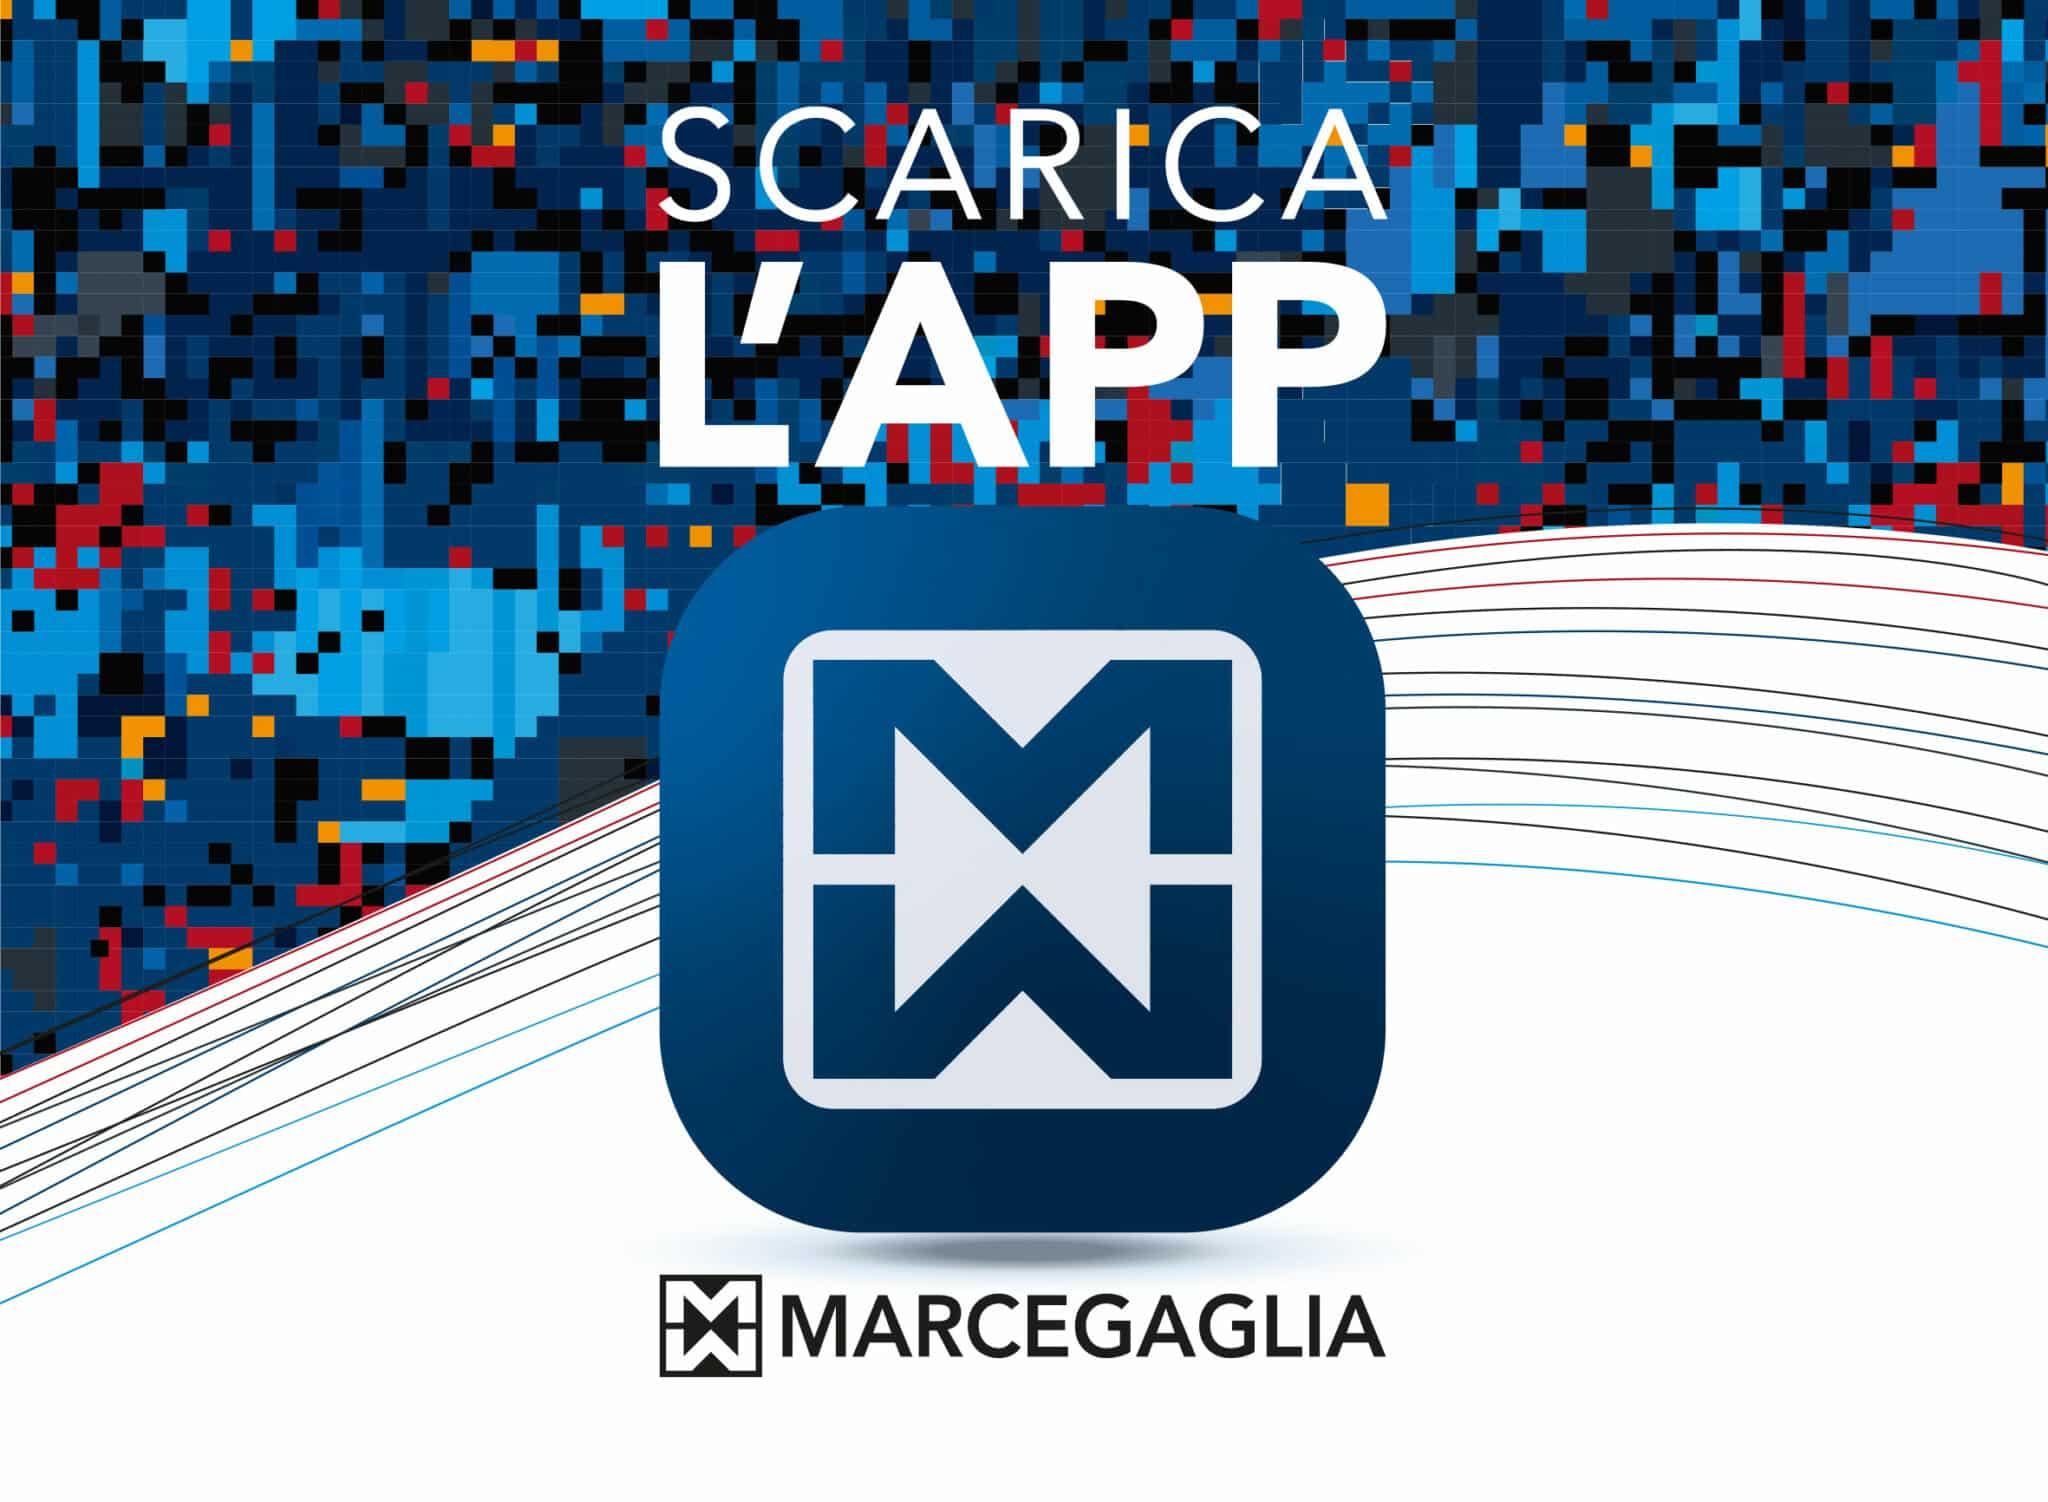 https://www.studiochiesa.it/wp-content/uploads/2020/10/Studio-Chiesa_Marcegaglia_app-01.jpg